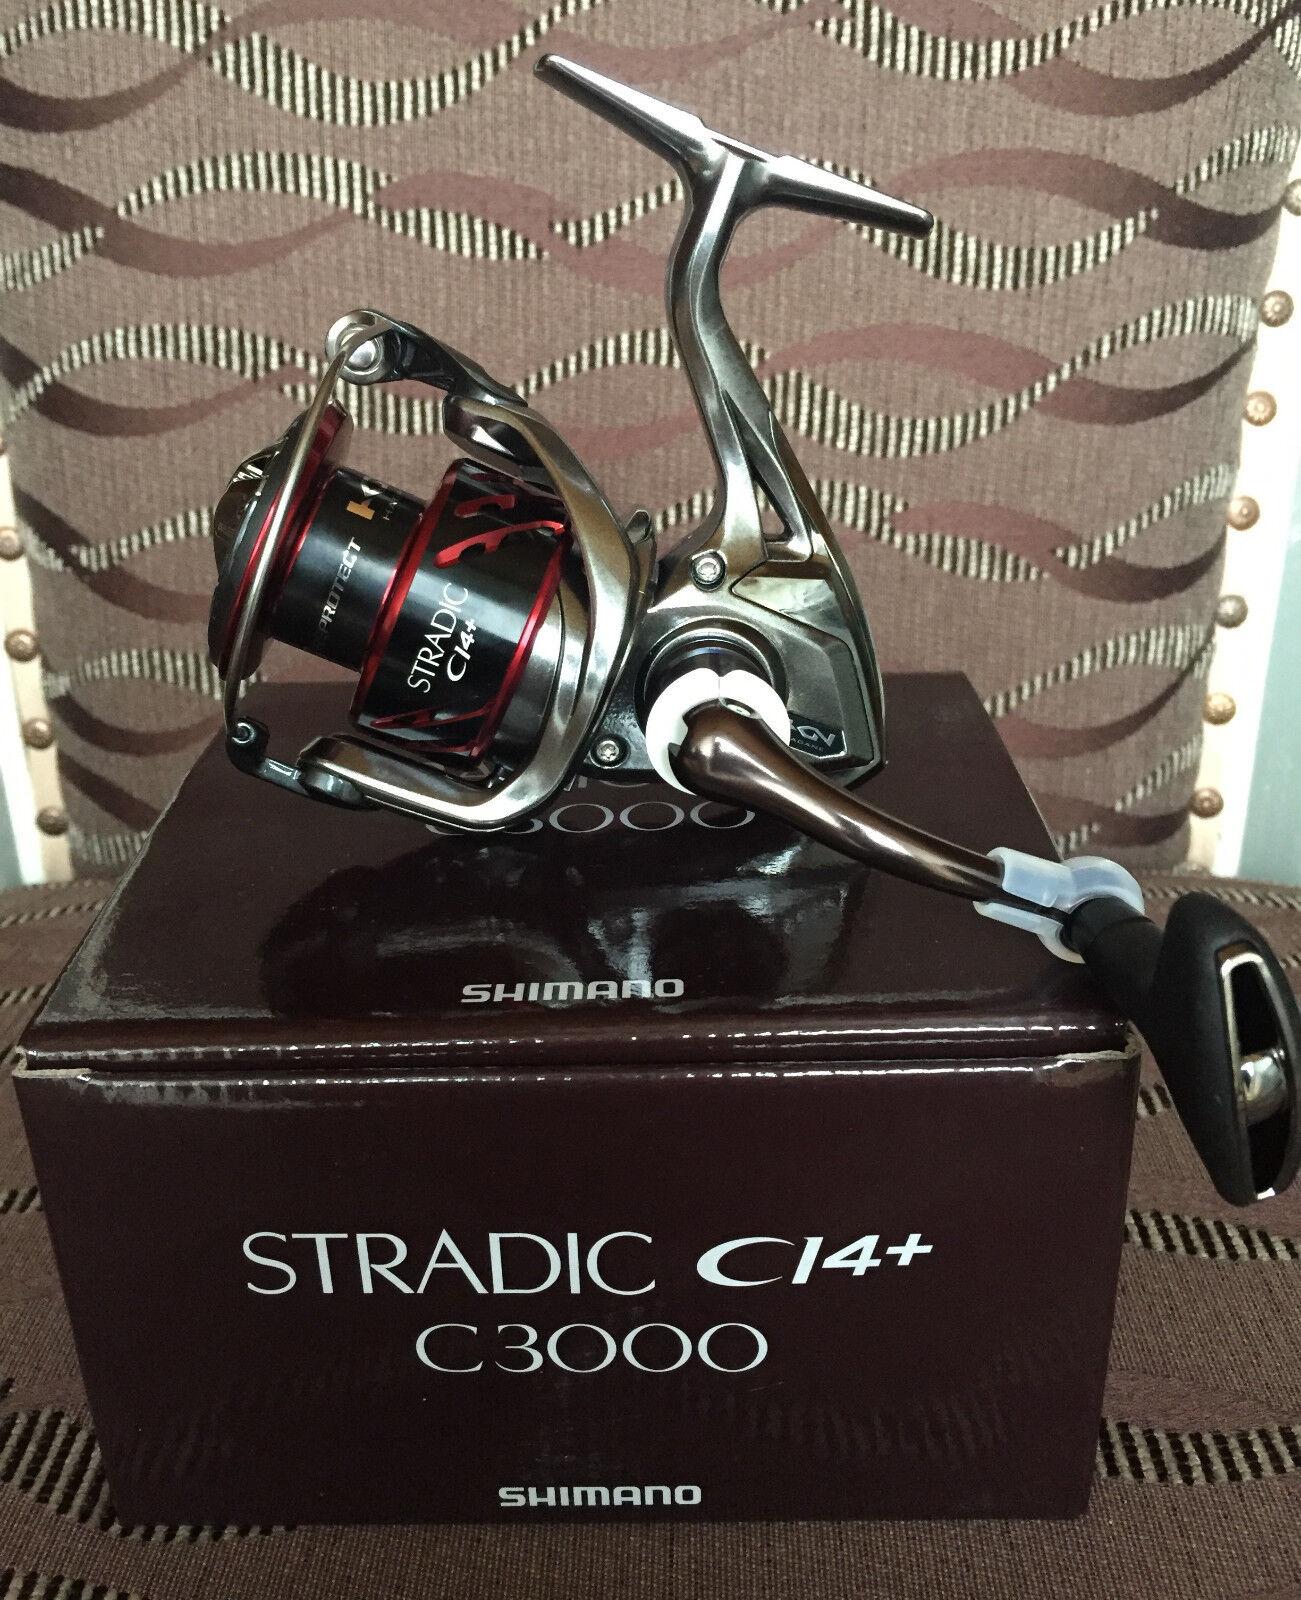 Shimano Stradic ci4 c3000 FB spinnrolle